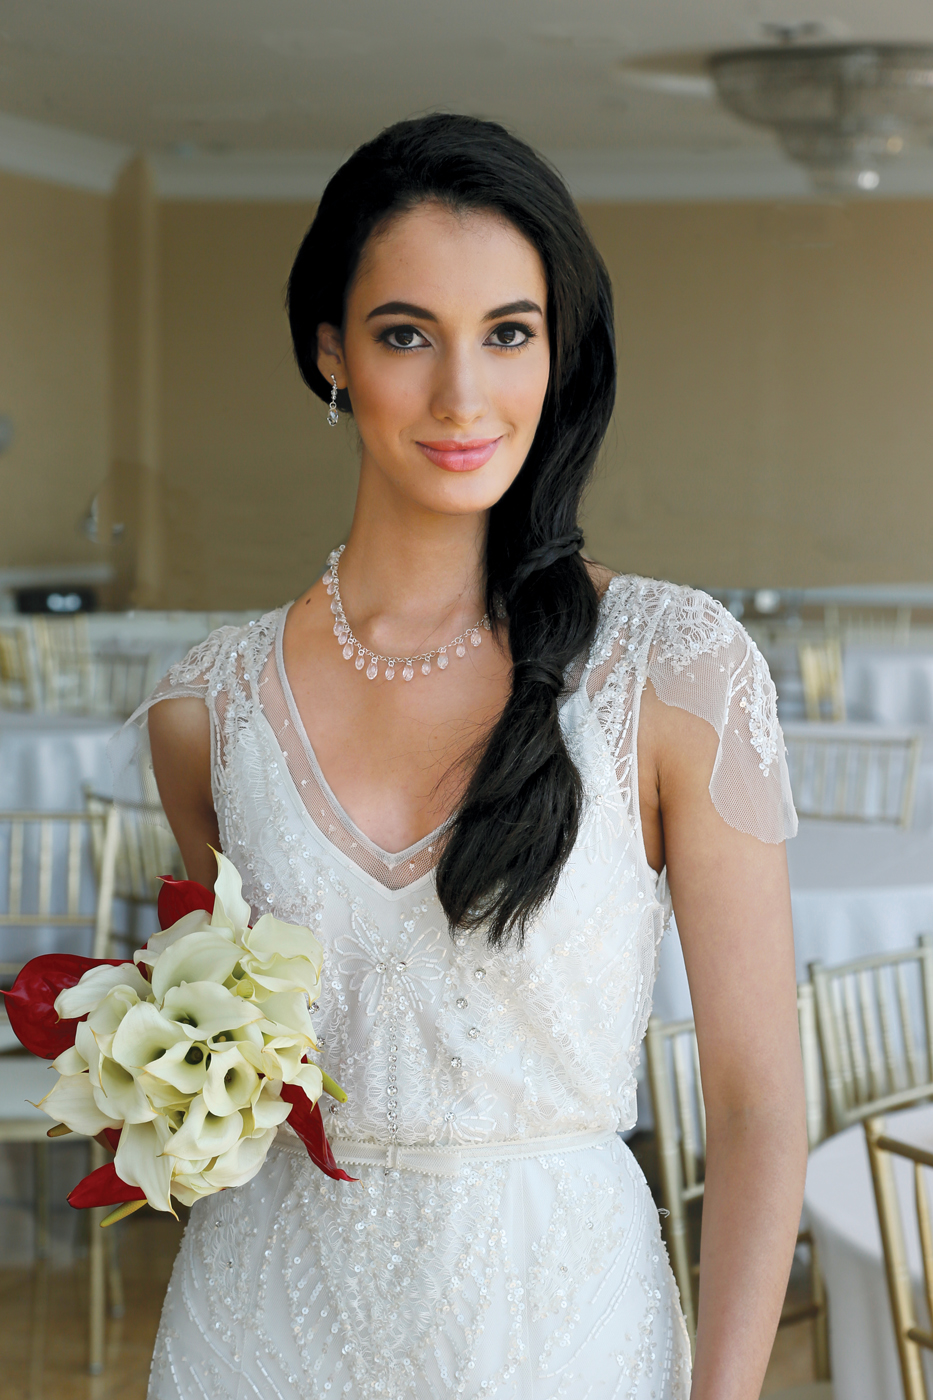 Nj Wedding Hair Newhairstylesformen2014 Com